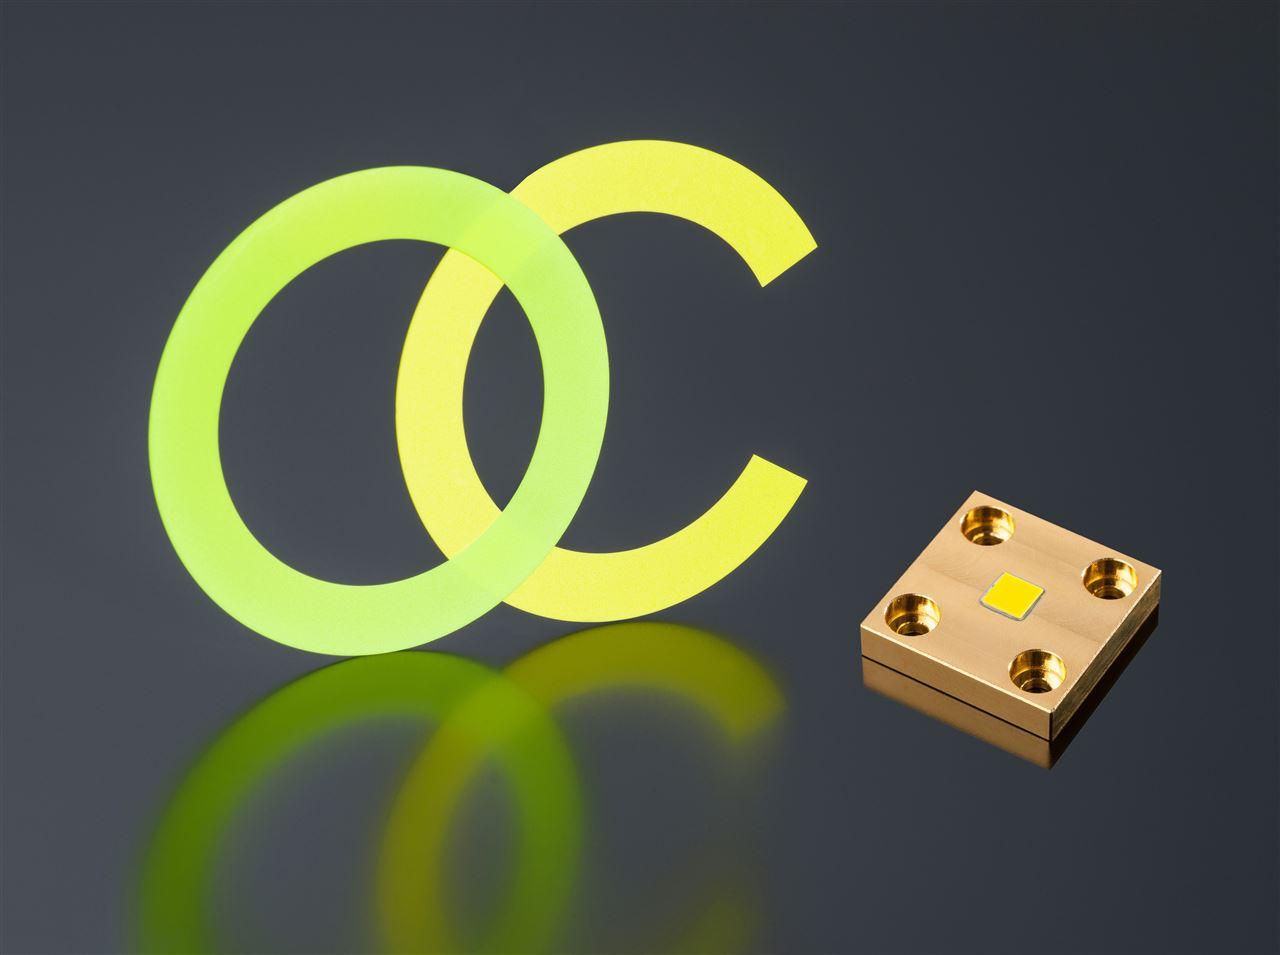 Ceramic Laser Phosphor Converter for High Luminance